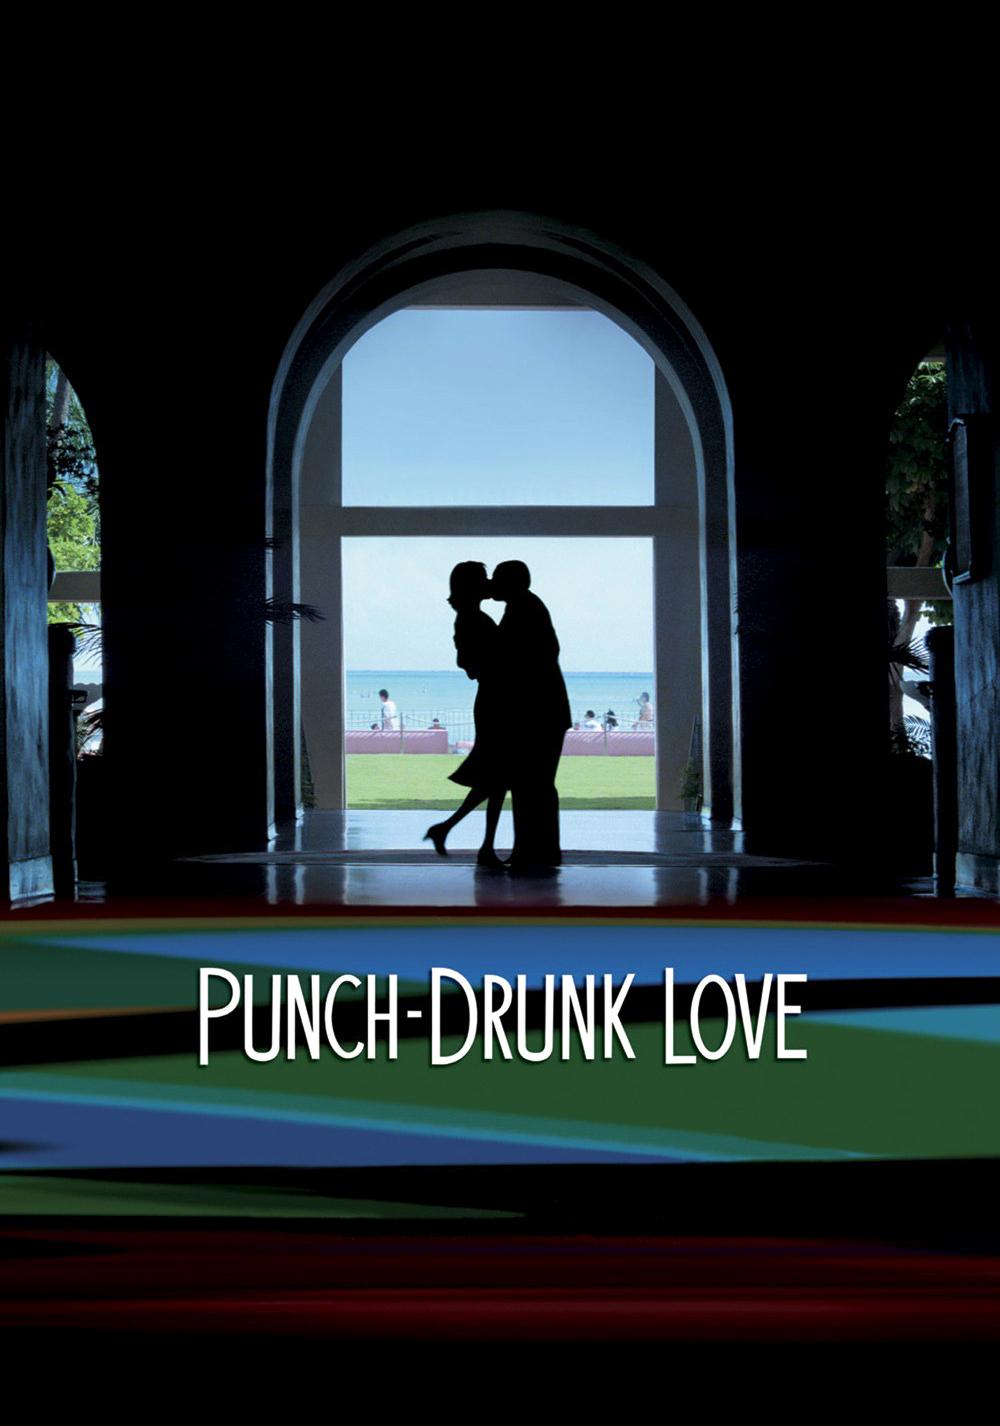 punch-drunk-love-555b301034e98.jpg